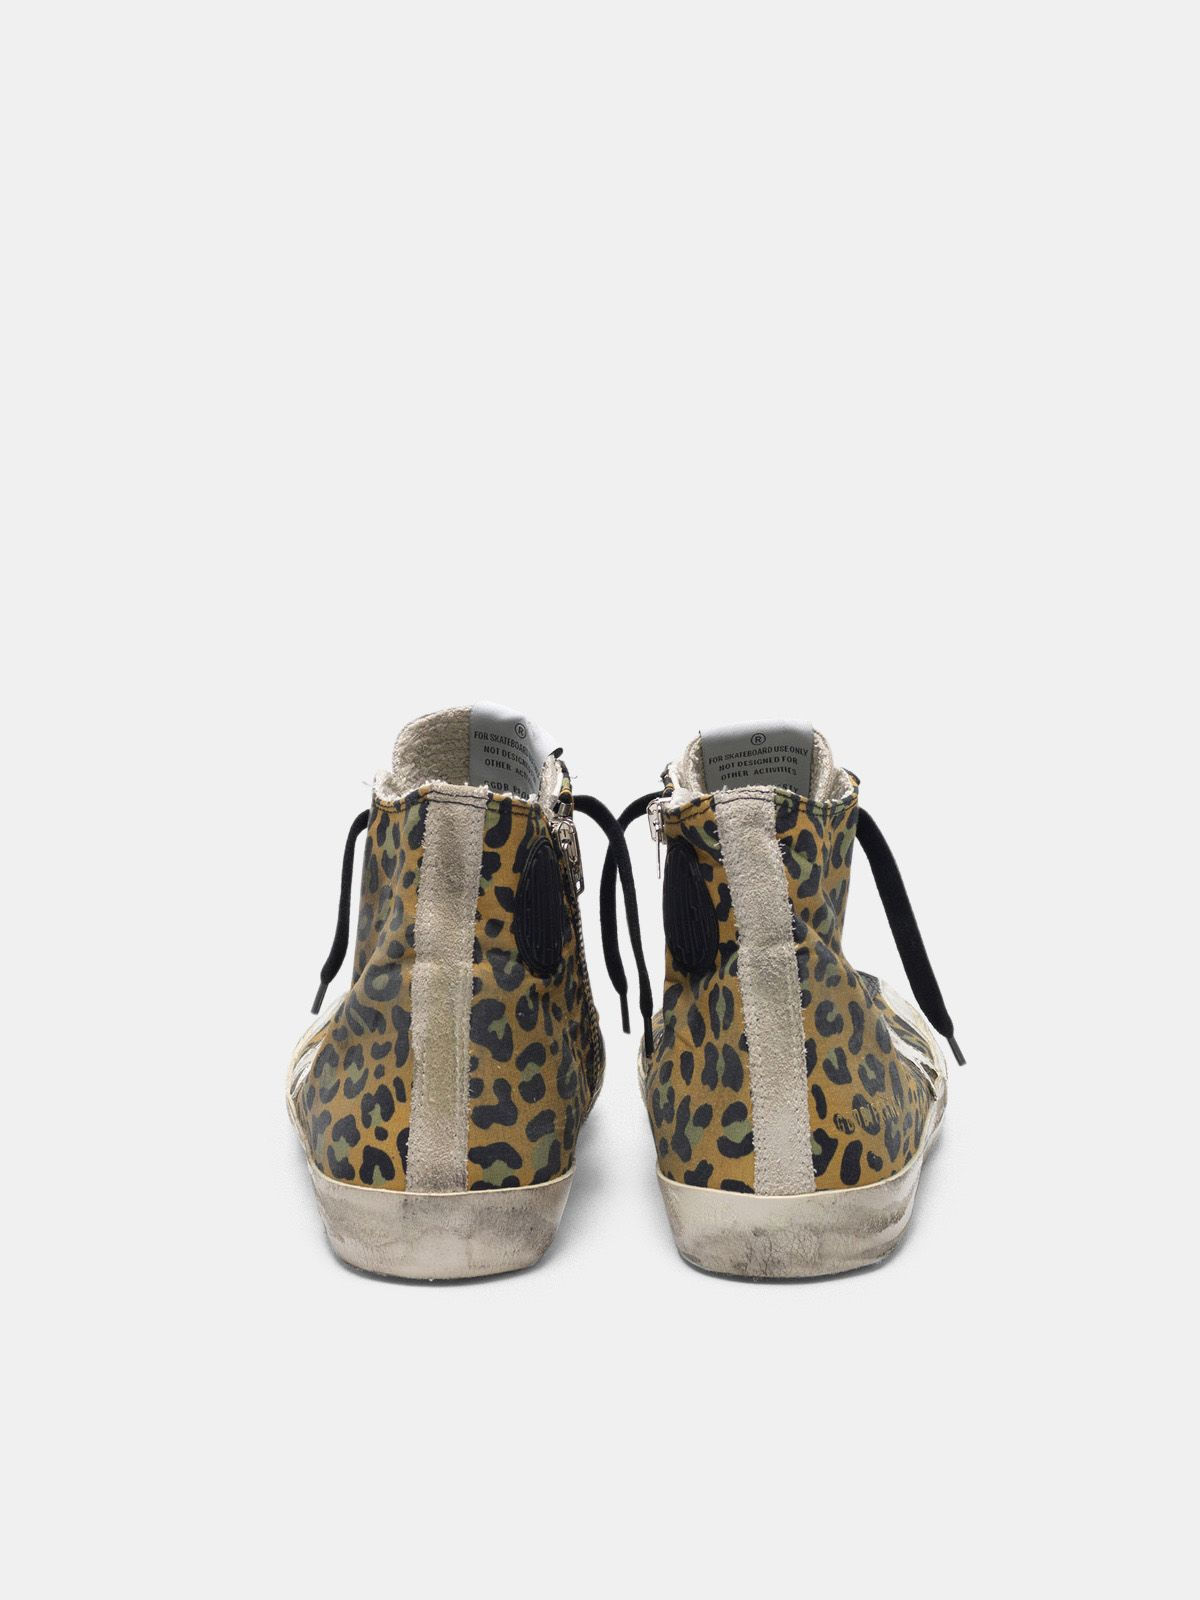 Golden Goose - Sneakers Francy in tela con motivo leopardato e pelle in